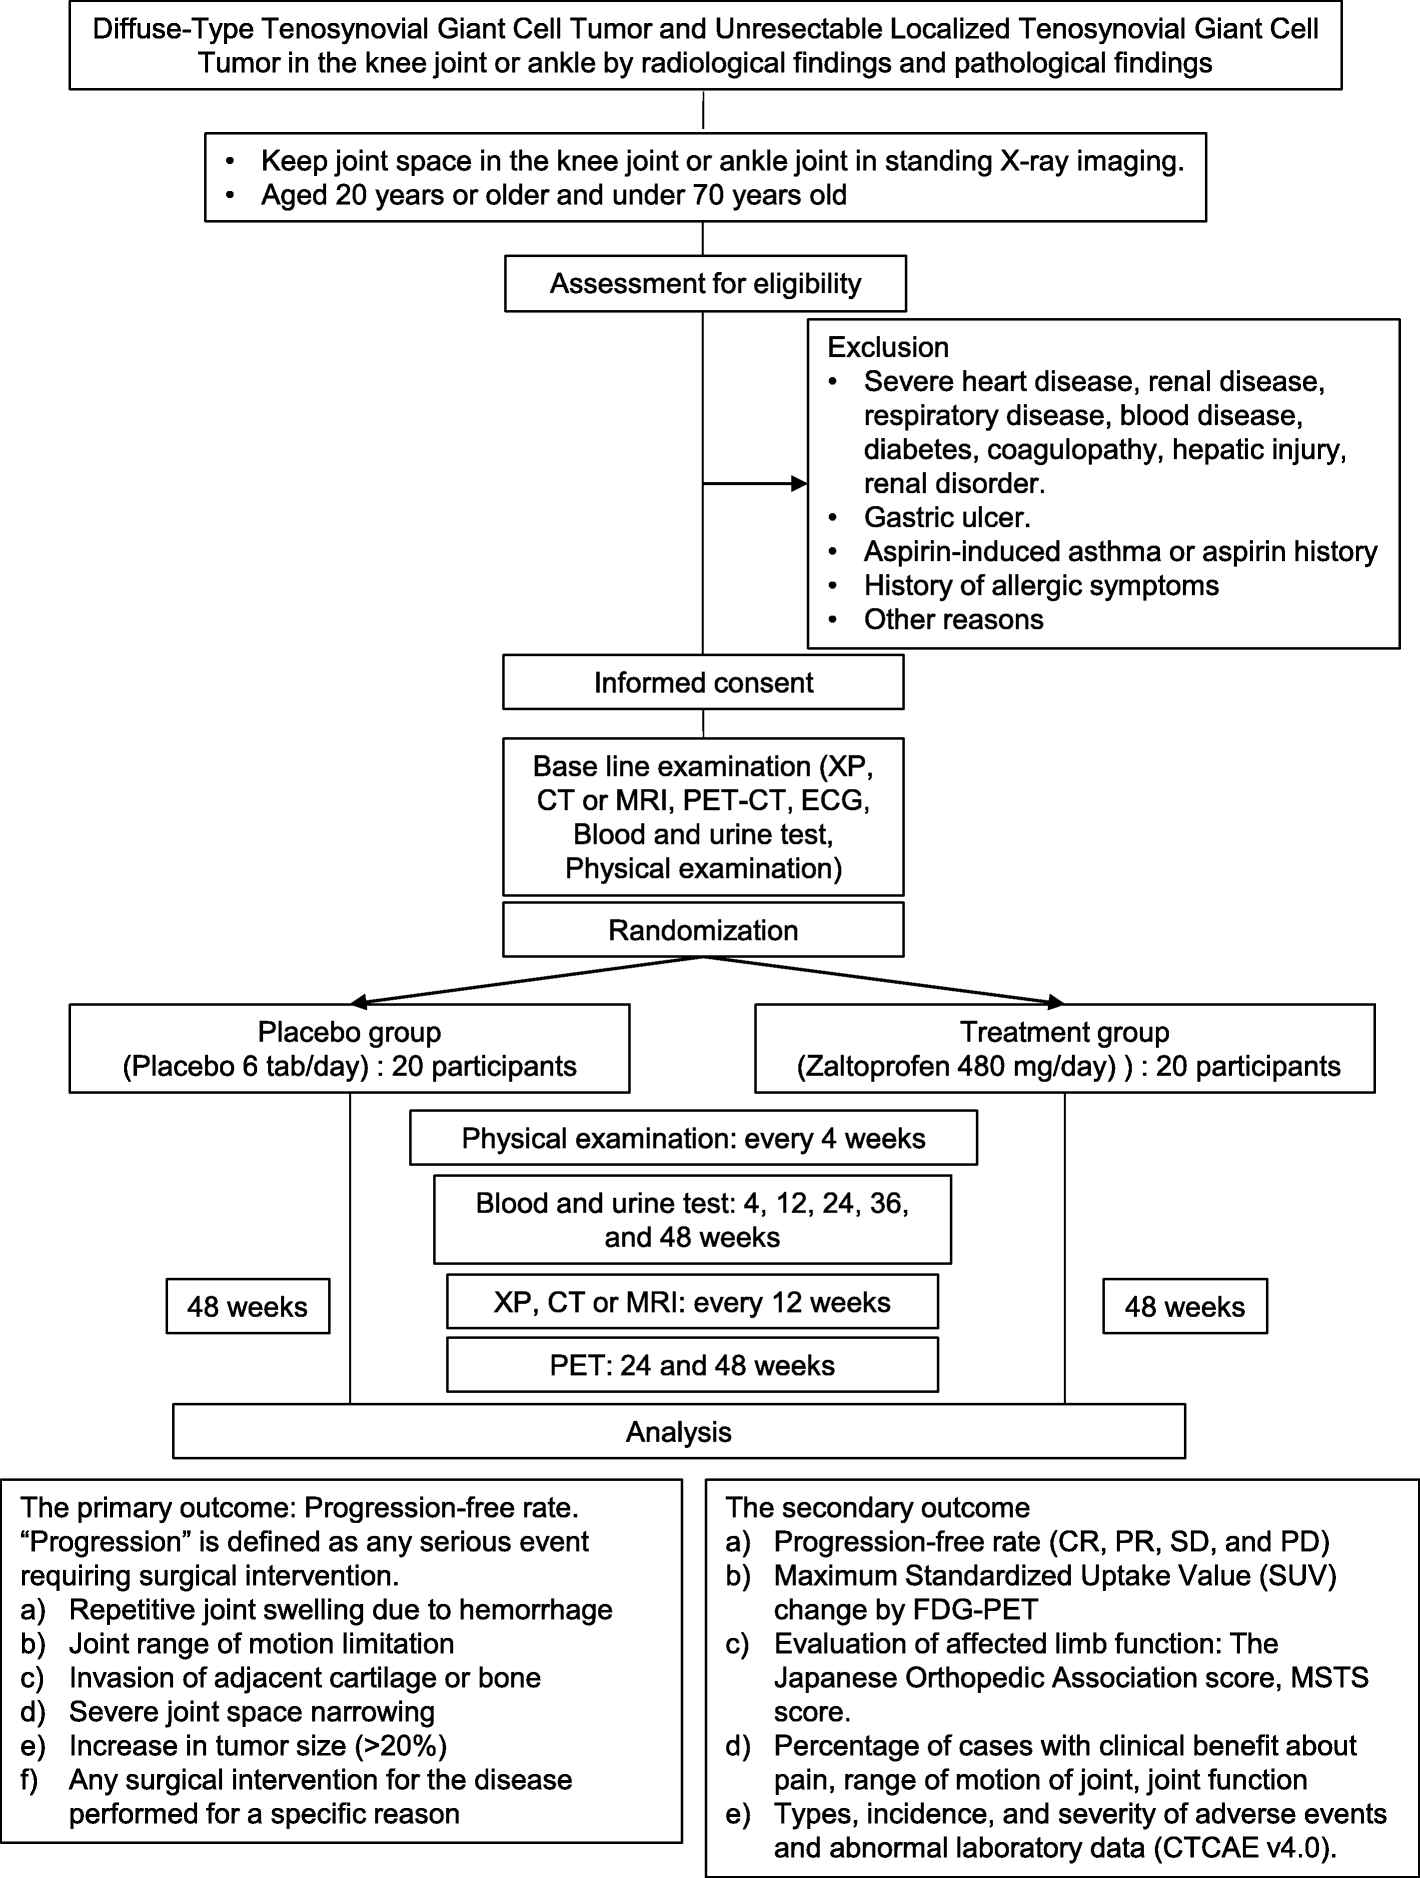 Randomized placebo-controlled double-blind phase II study of